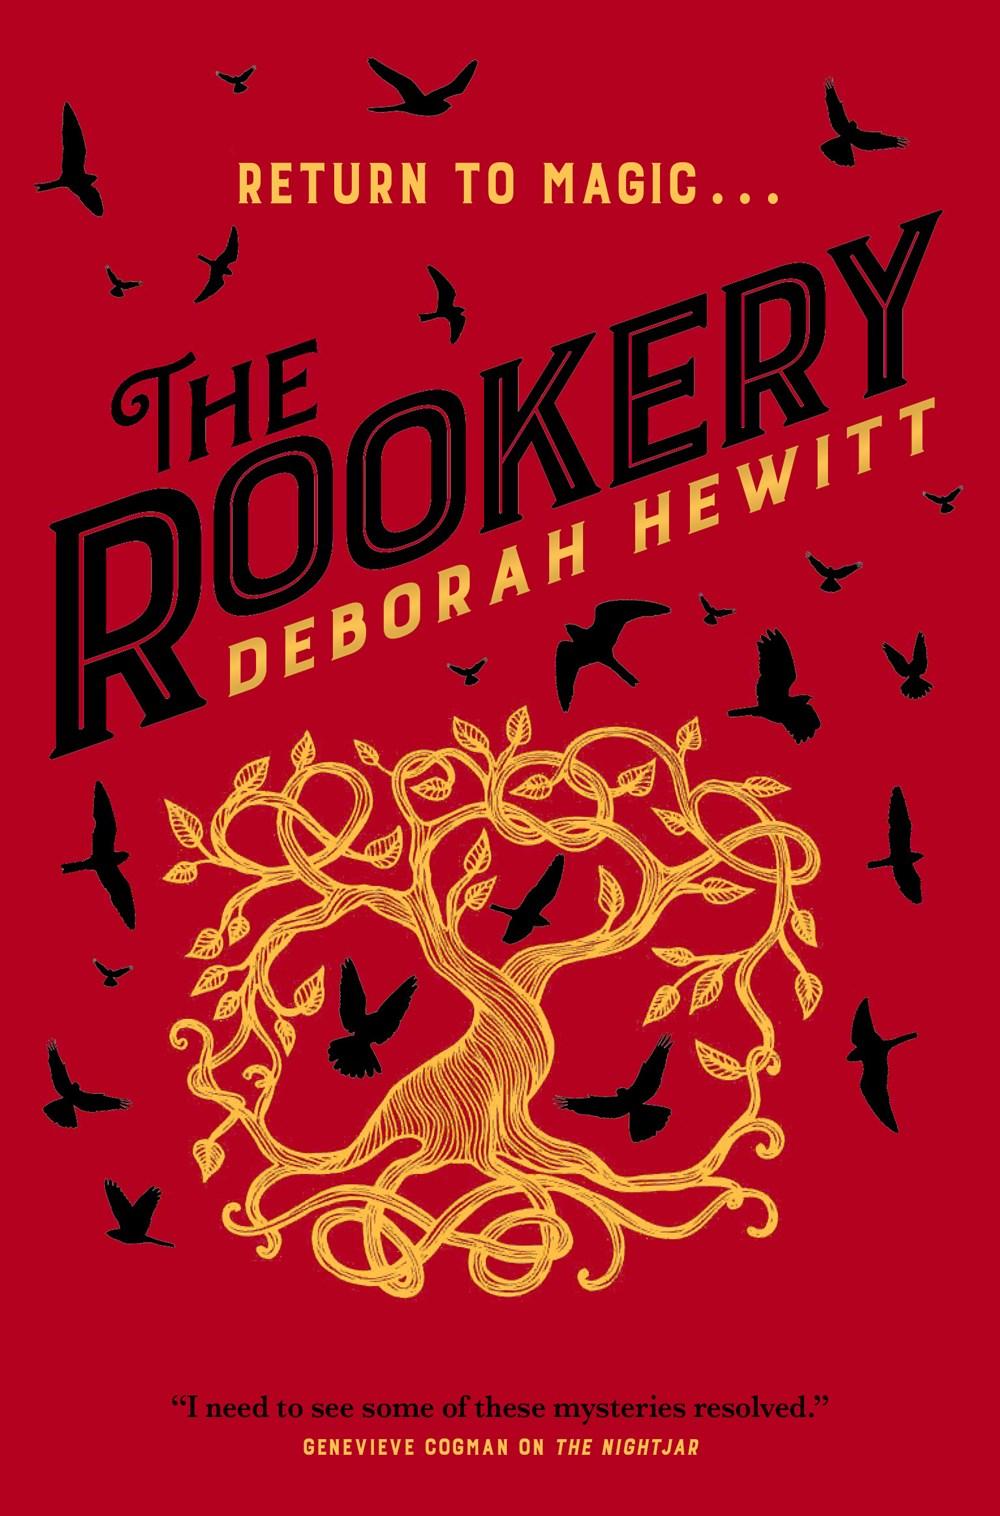 The Rookery by Deborah Hewitt